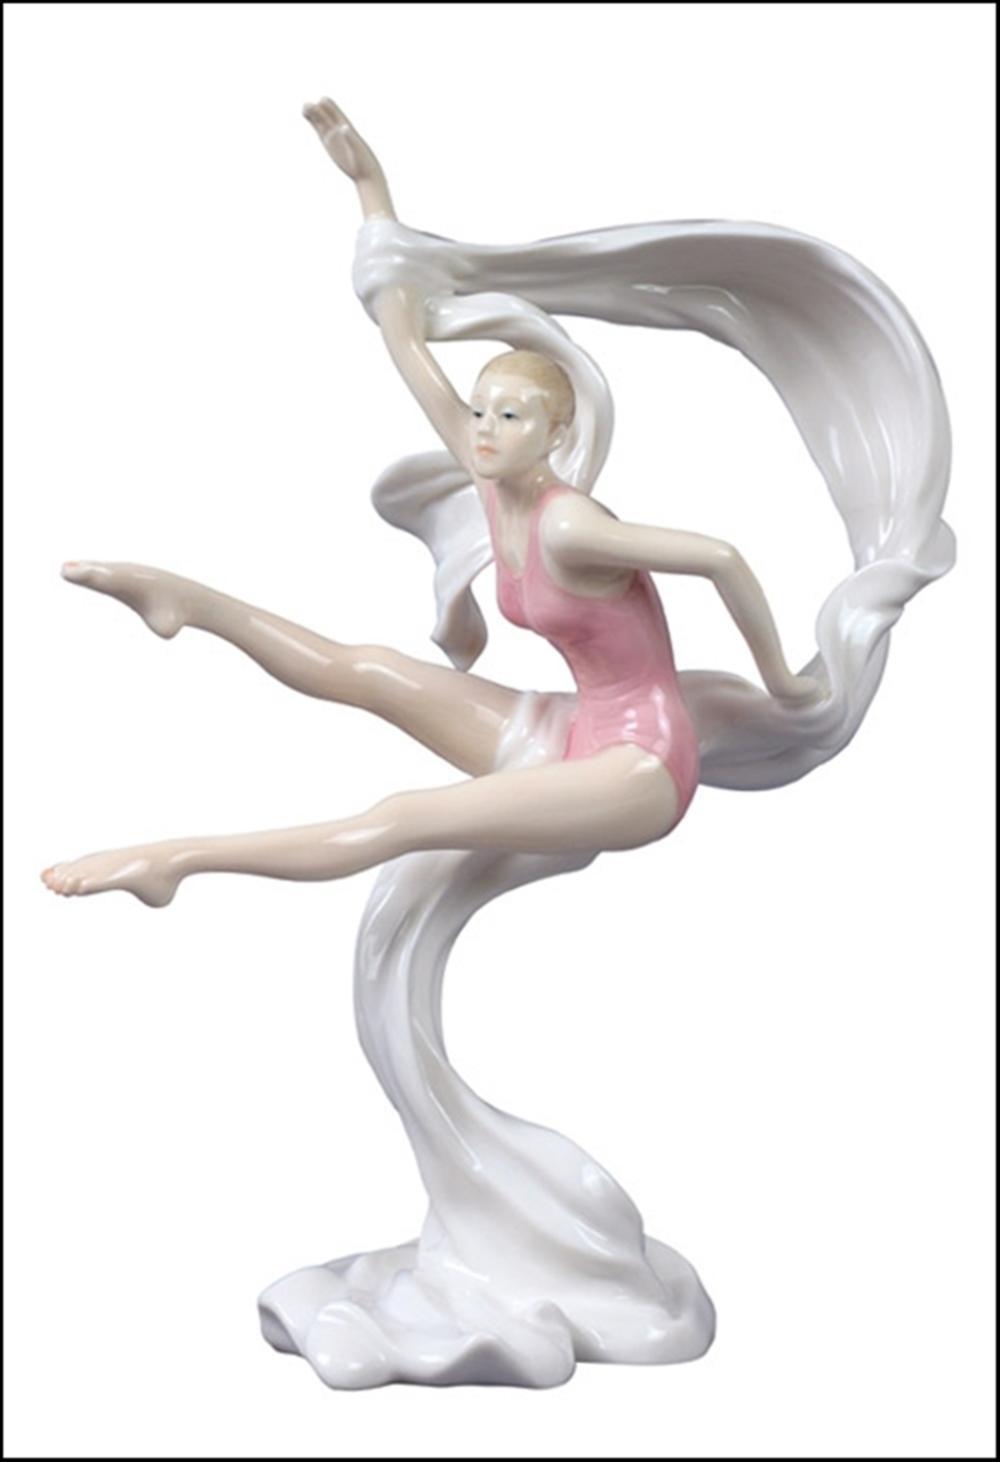 MODERN DANCE FEMALE JUMP WITH RIBBON